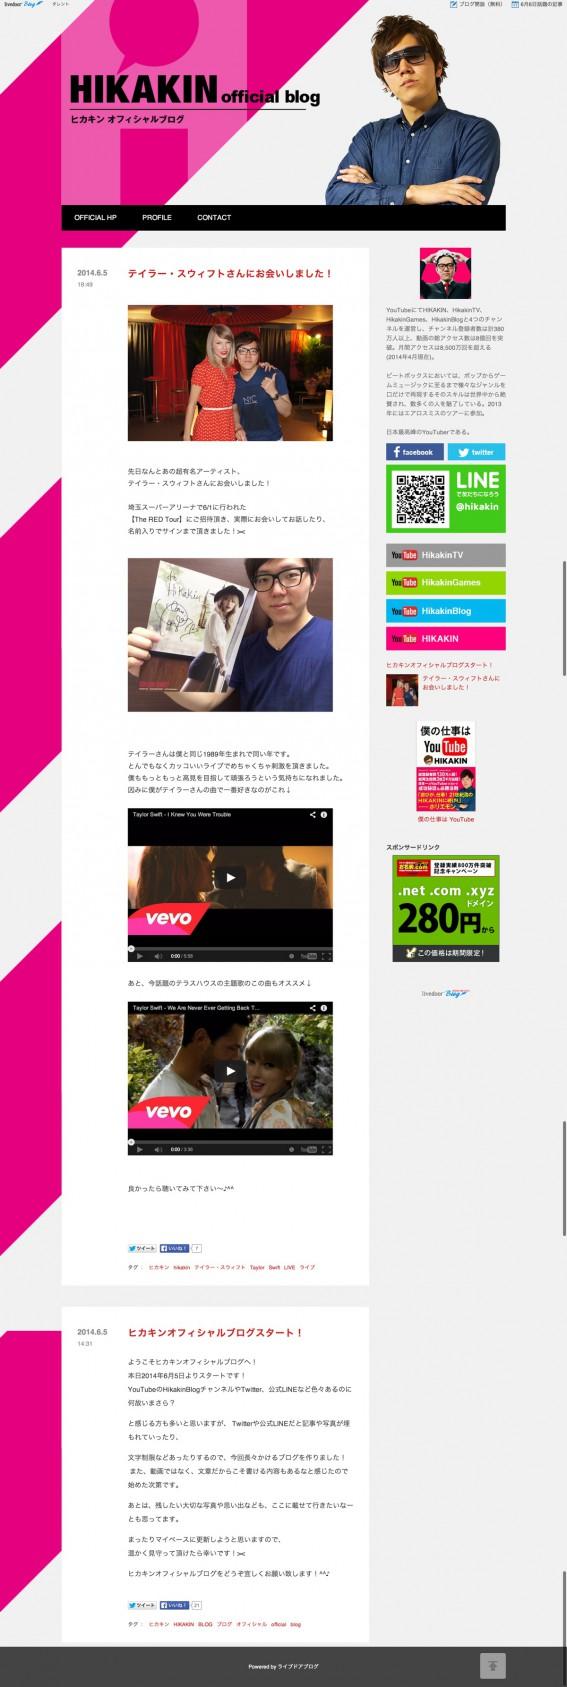 HIKAKIN オフィシャルブログ